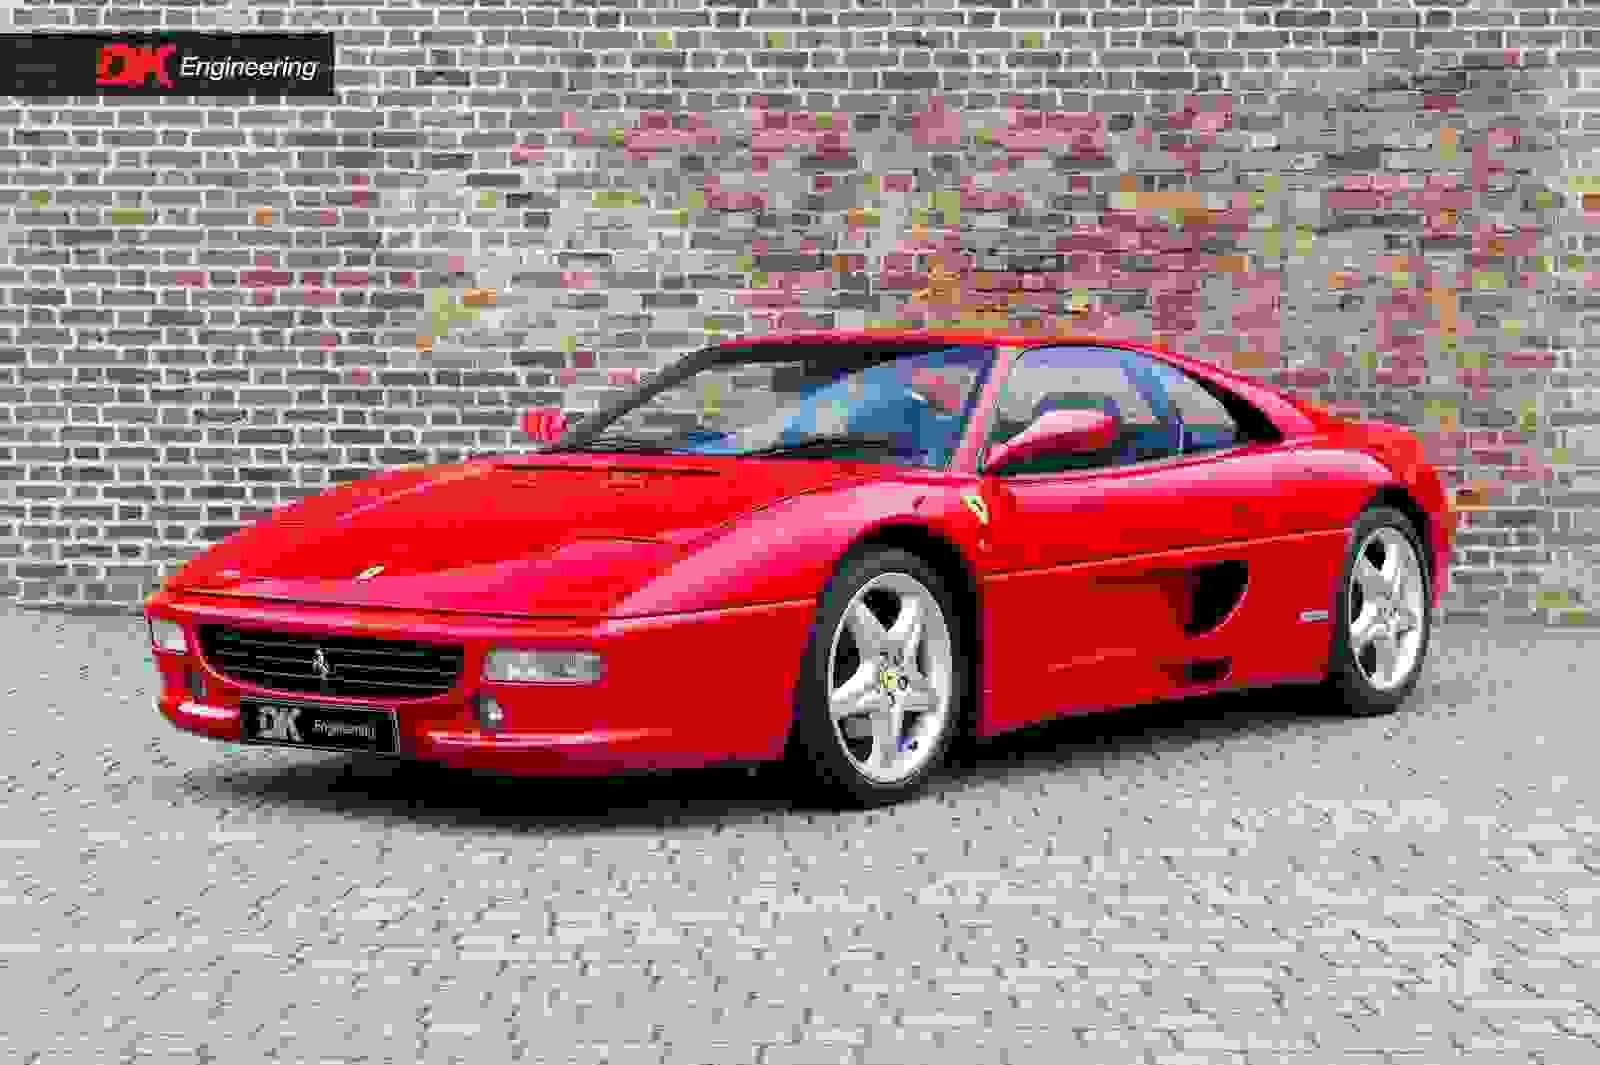 Ferrari 355 Berlinetta - DK Engineering